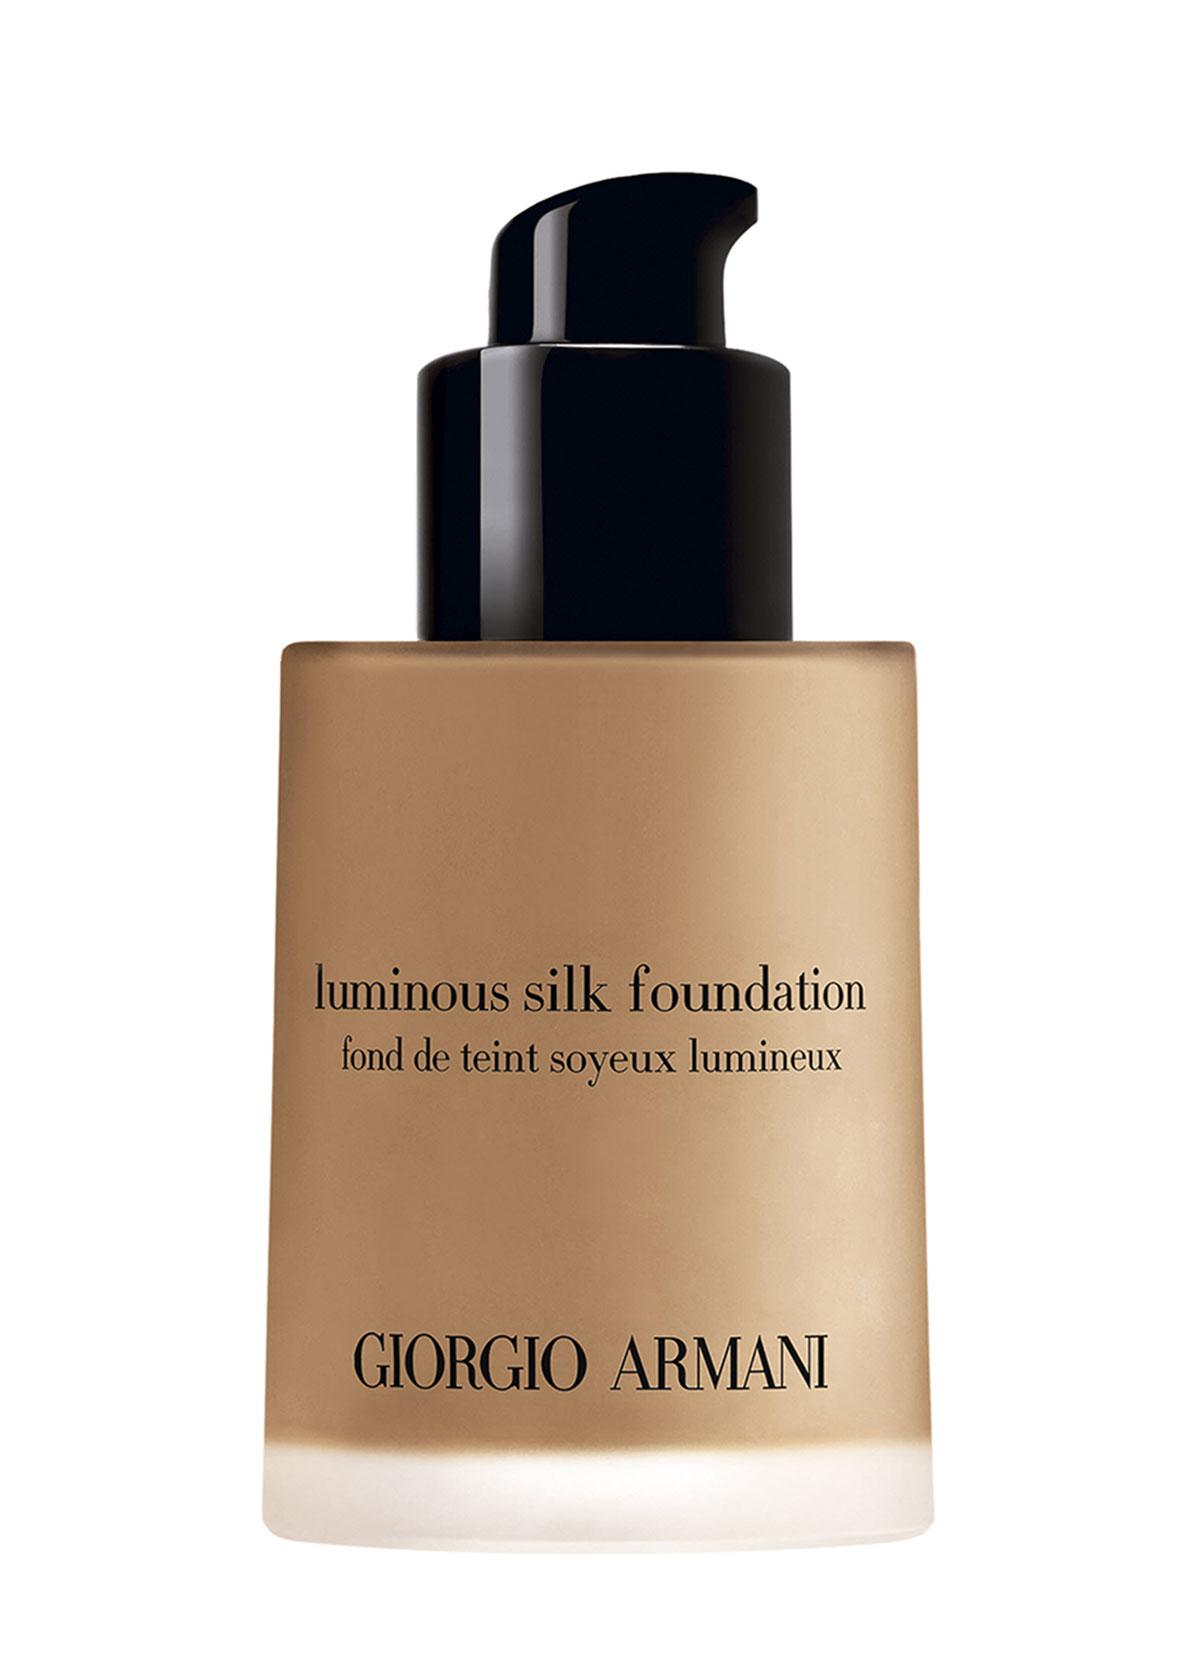 GIORGIO ARMANI Luminous Silk Foundation 2017 Instyle Award Winner in 8